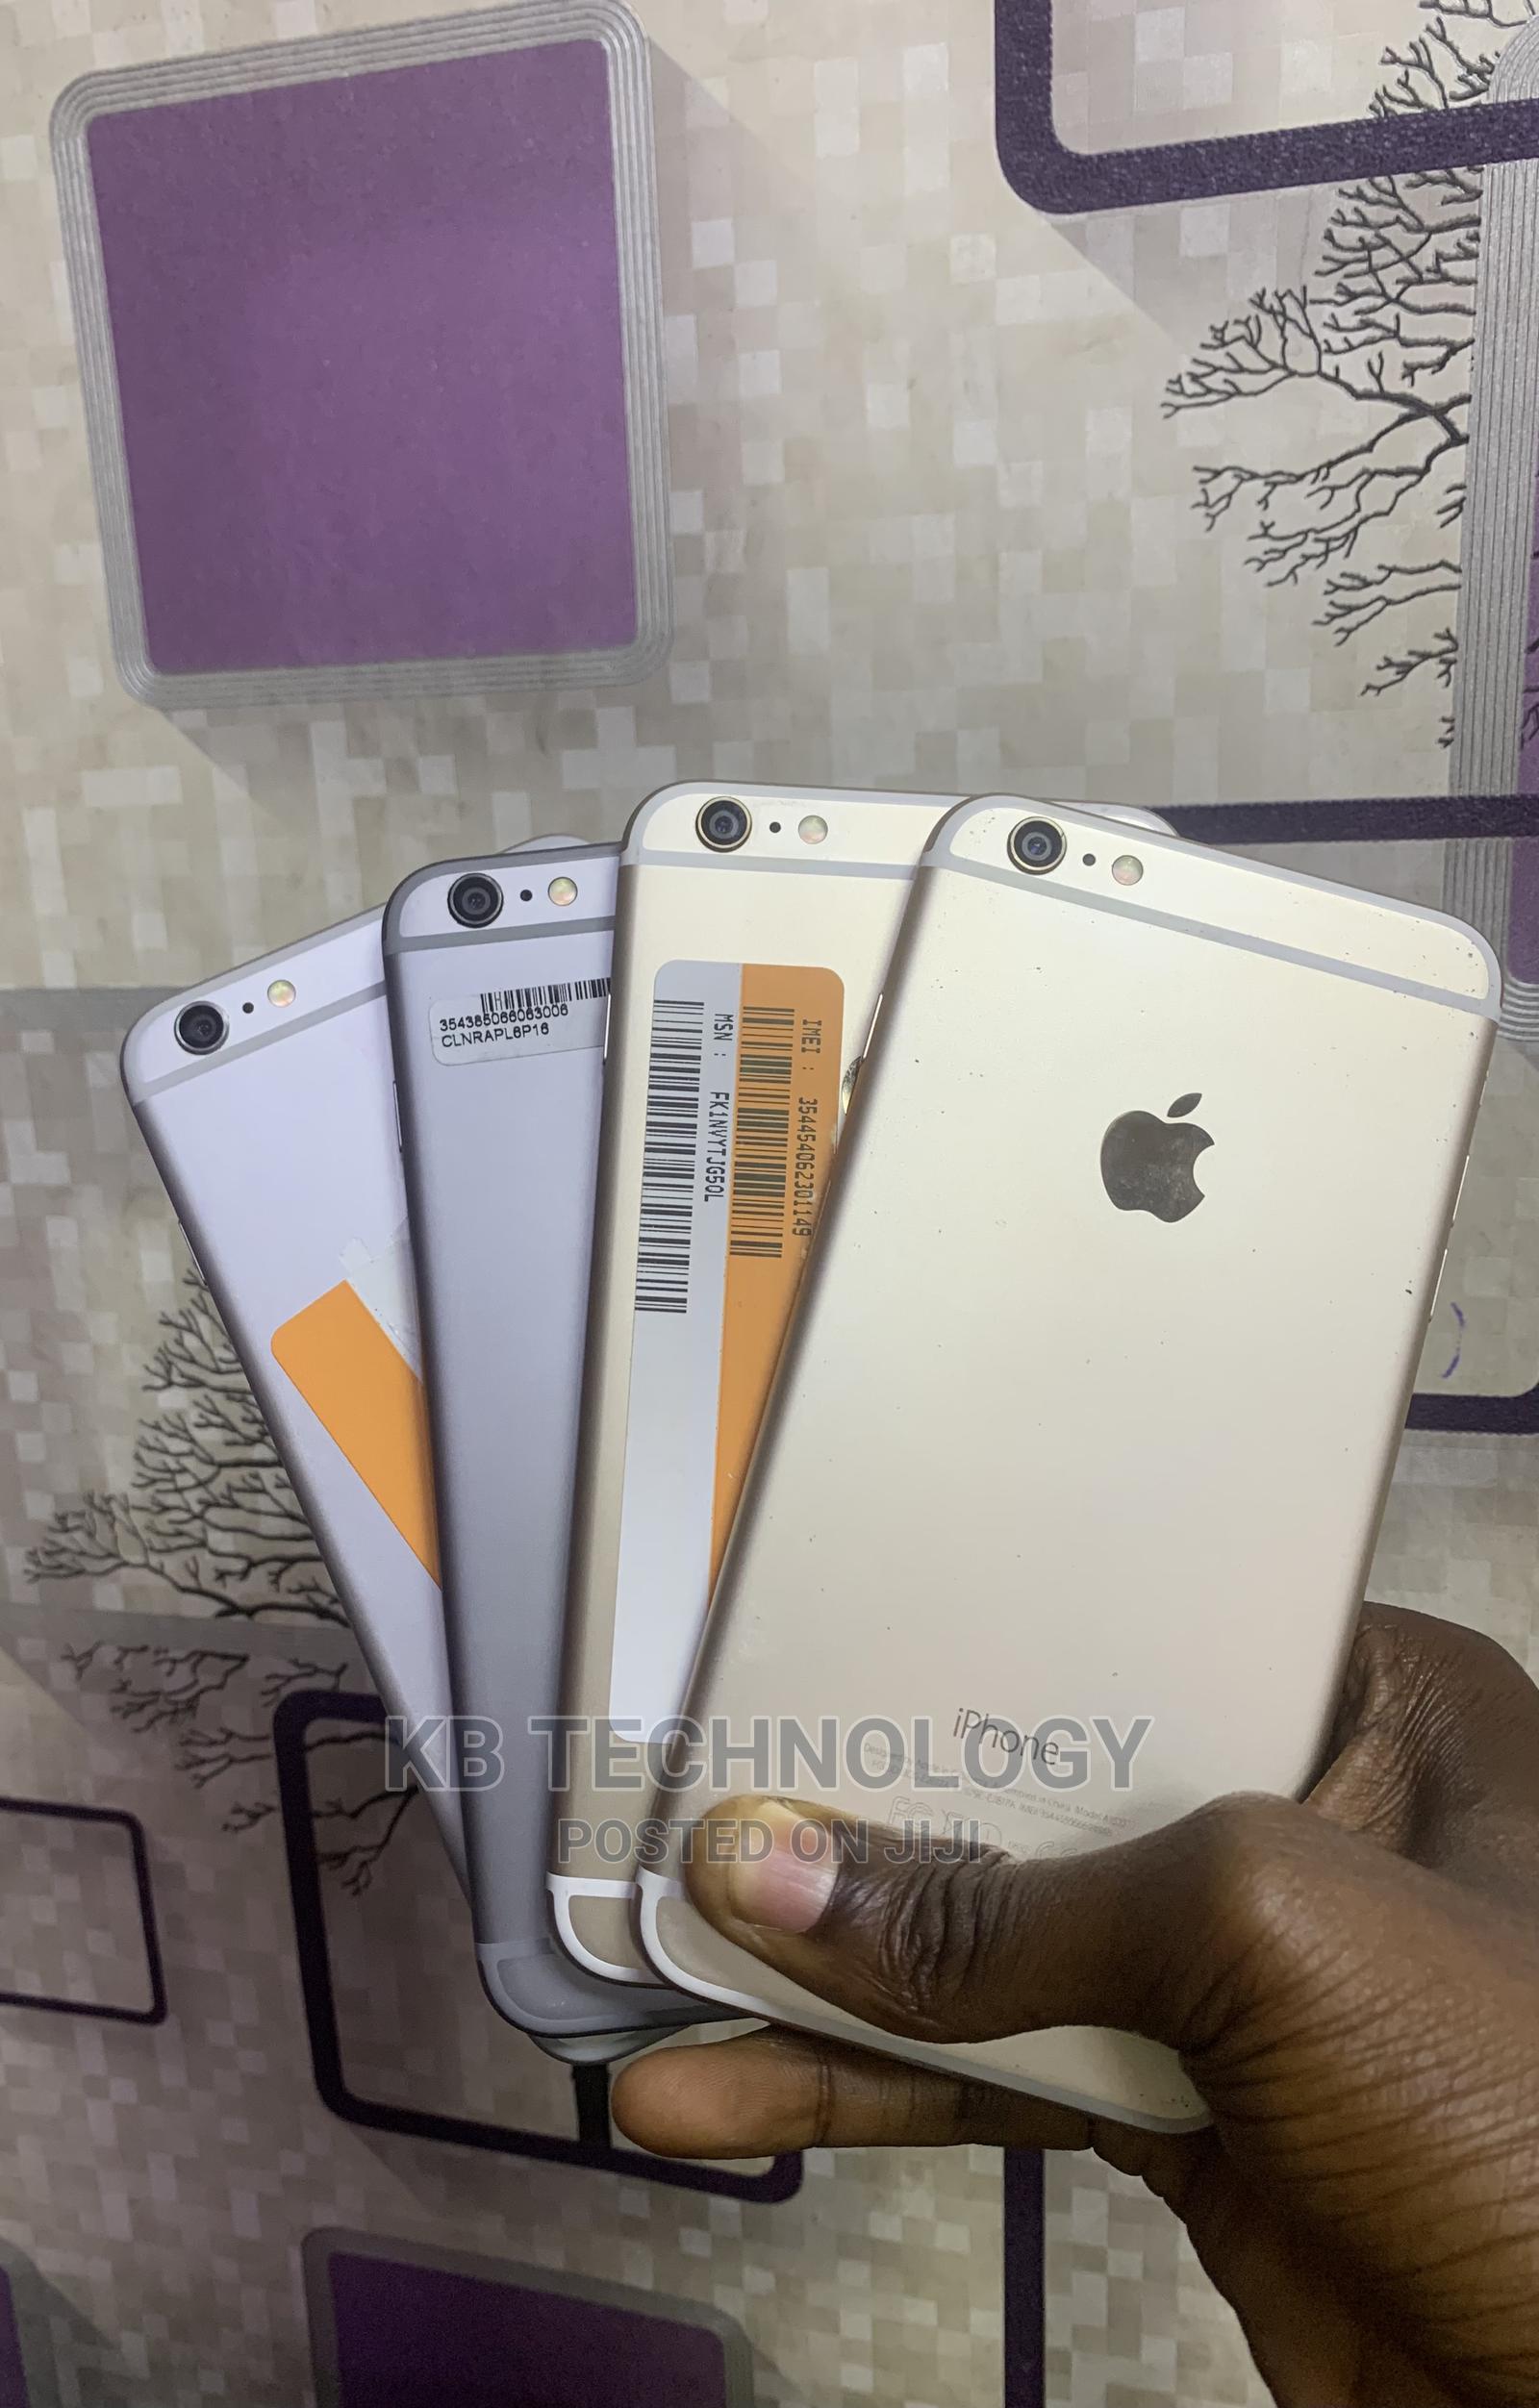 Apple iPhone 6 Plus 64 GB Gray | Mobile Phones for sale in Ibadan, Oyo State, Nigeria